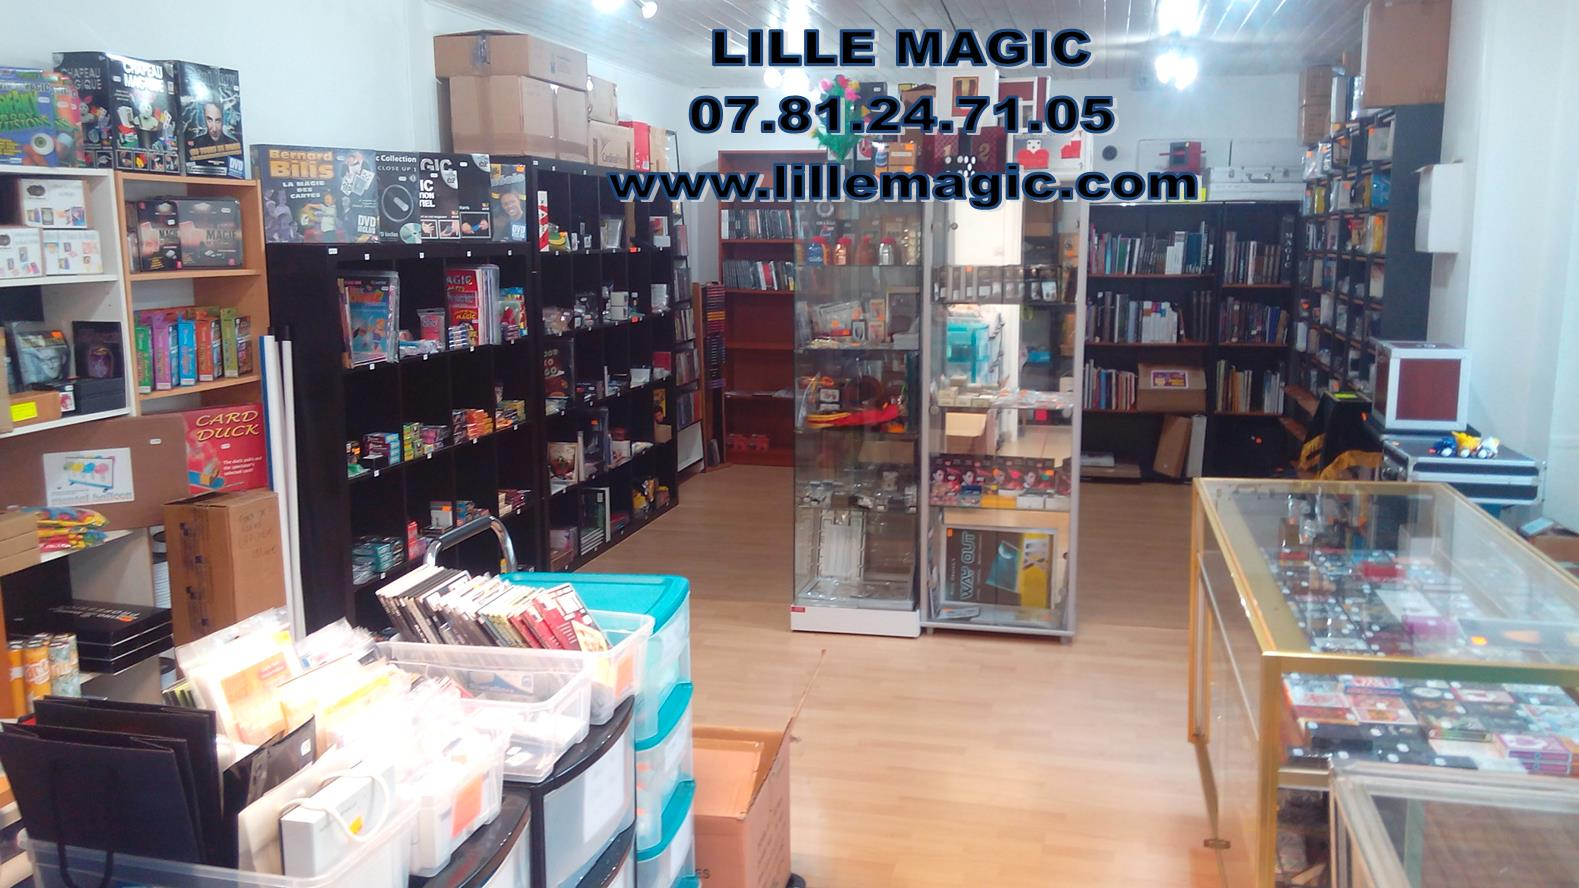 LILLE MAGIC